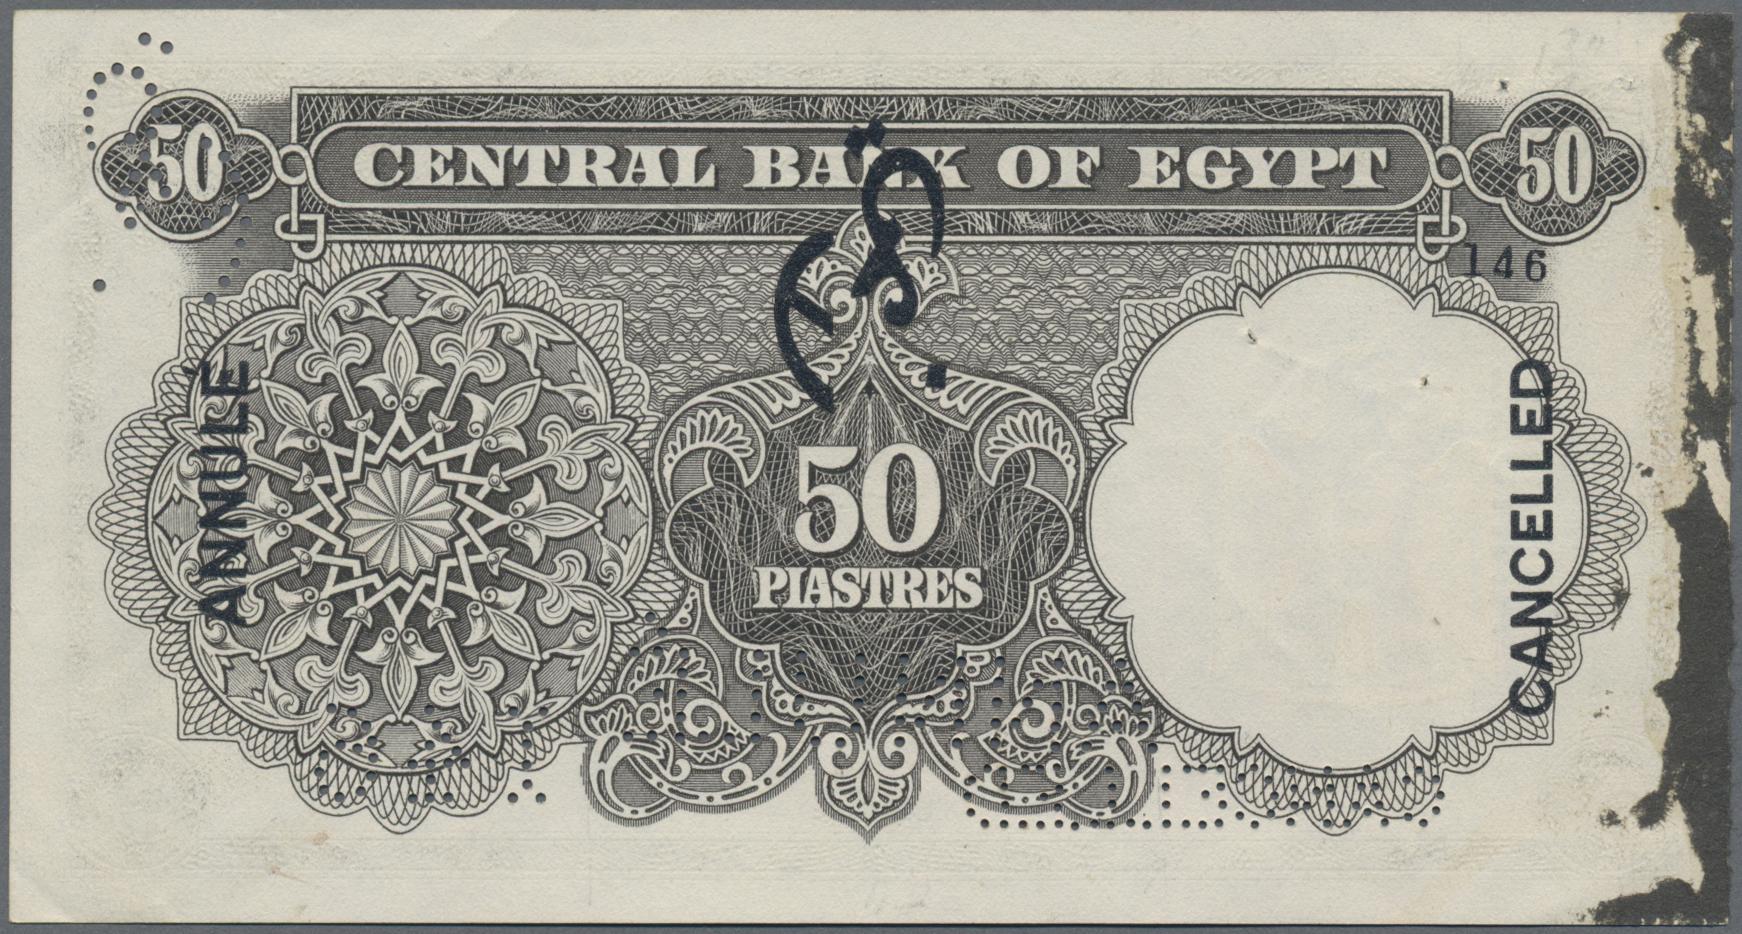 Lot 00211 - Egypt / Ägypten | Banknoten  -  Auktionshaus Christoph Gärtner GmbH & Co. KG Sale #48 The Banknotes